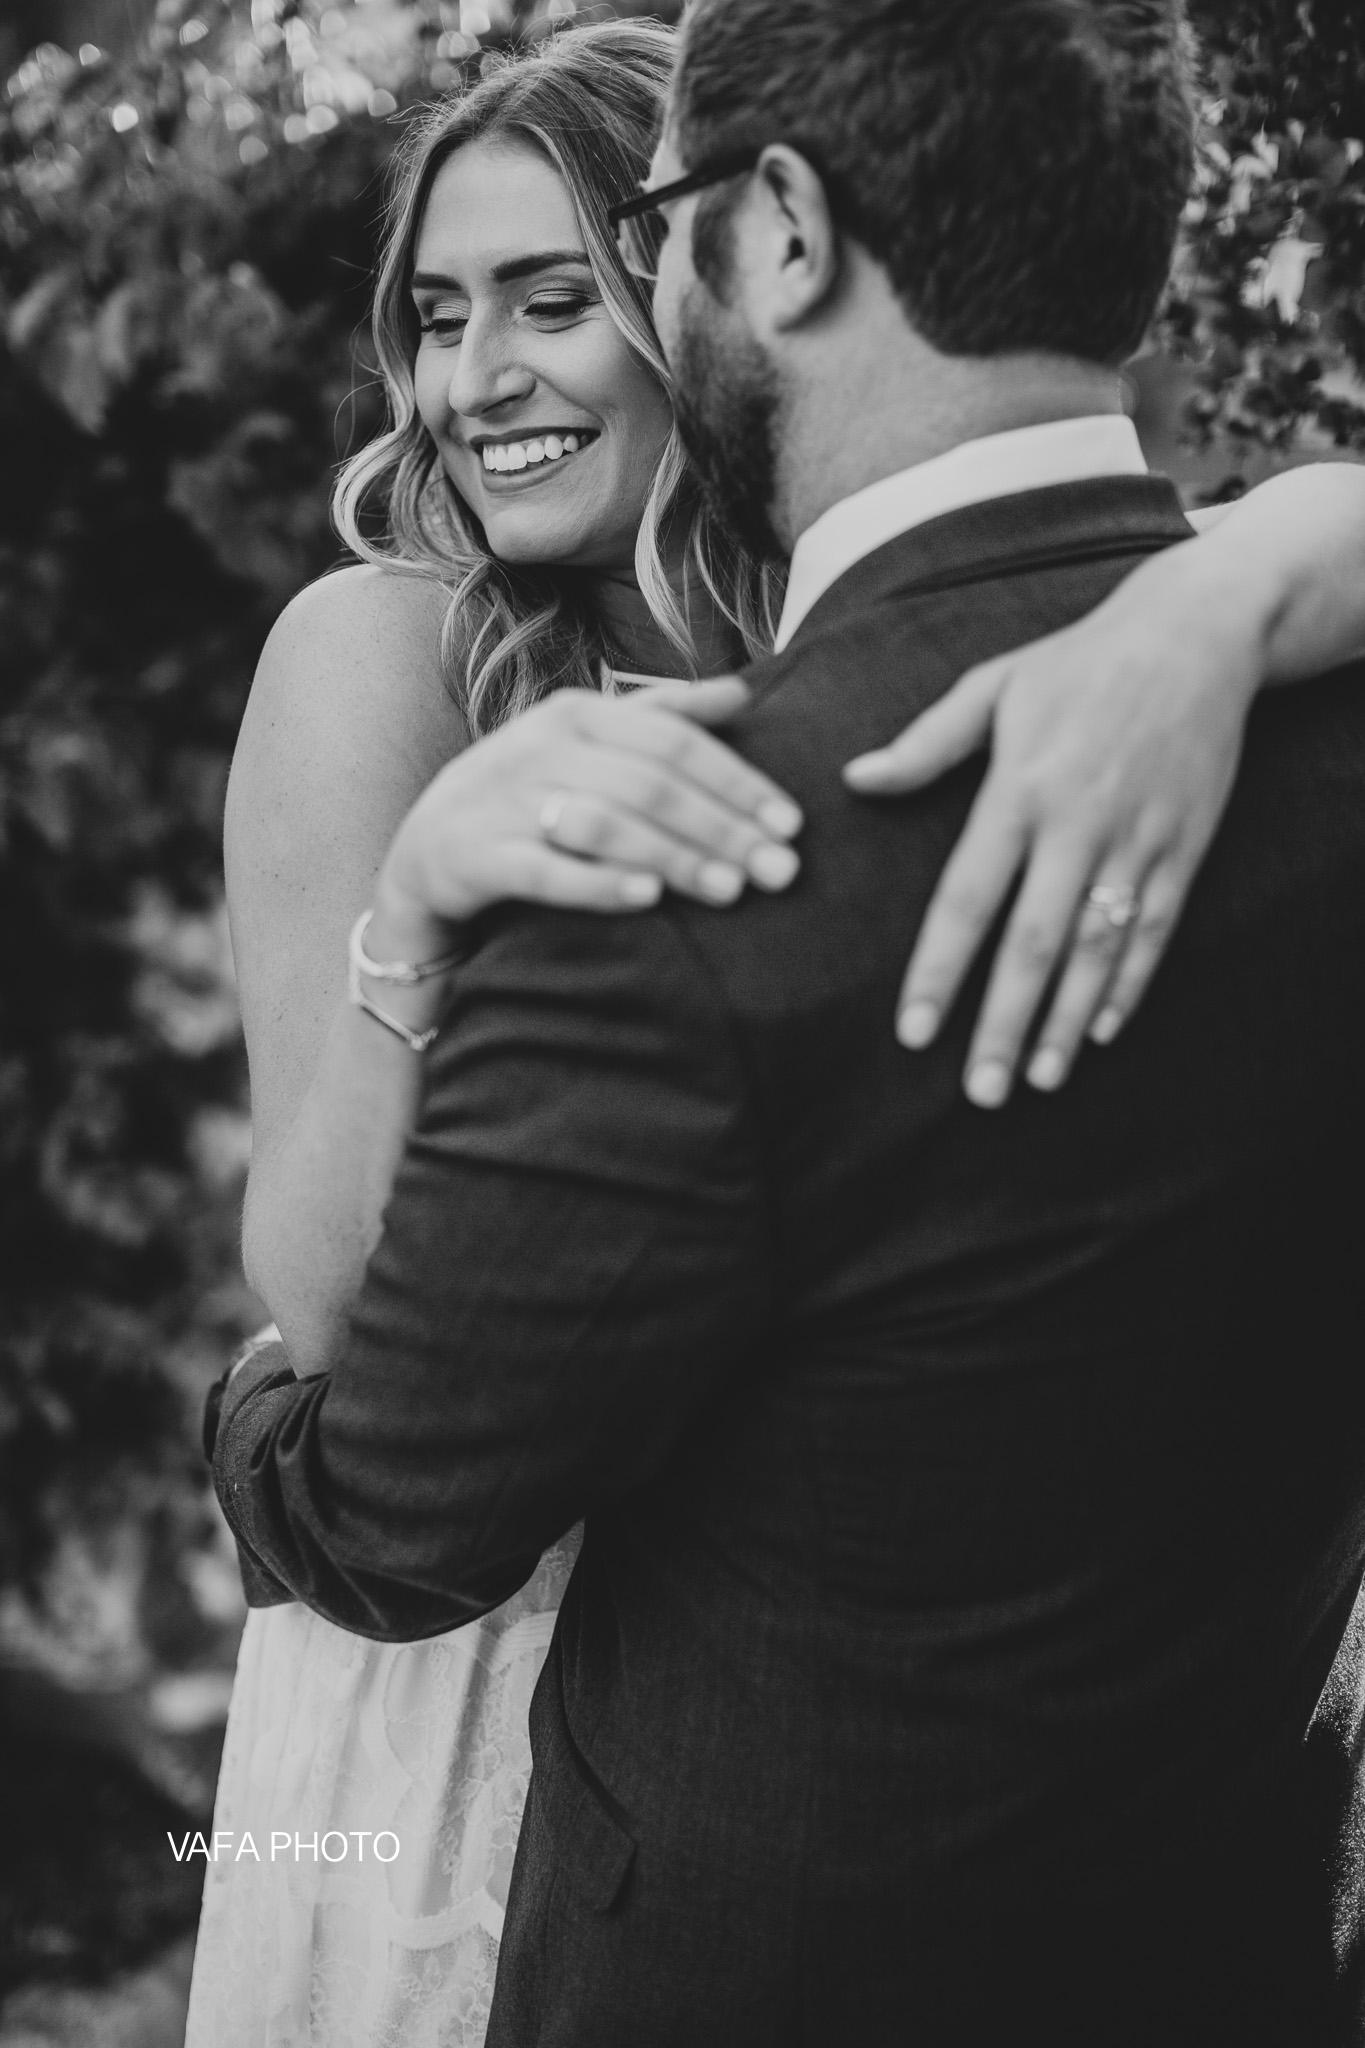 Leo-Carrillo-Ranch-Wedding-Lauren-Mike-Vafa-Photo-778.jpg